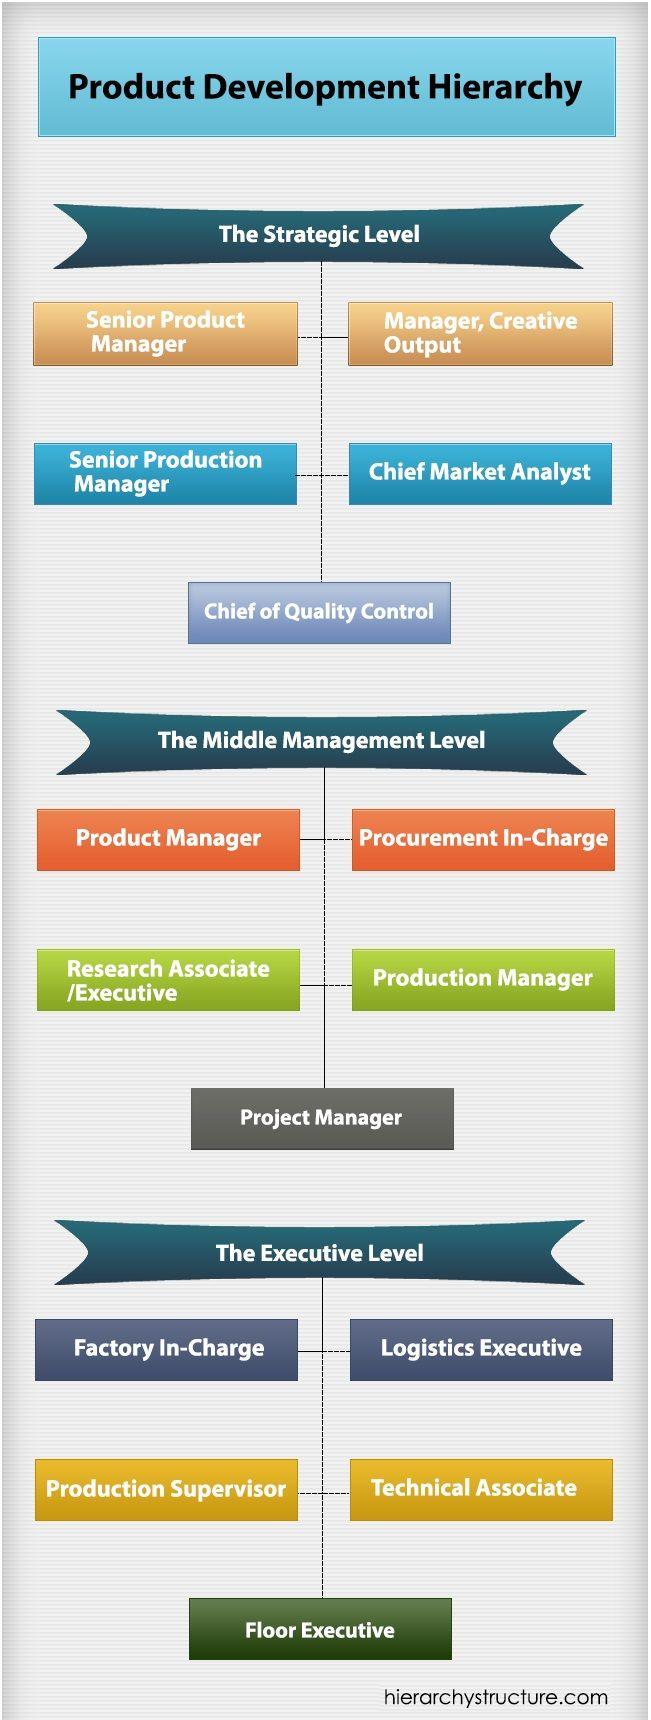 Product Development Hierarchy Development Personal Marketing New Product Development